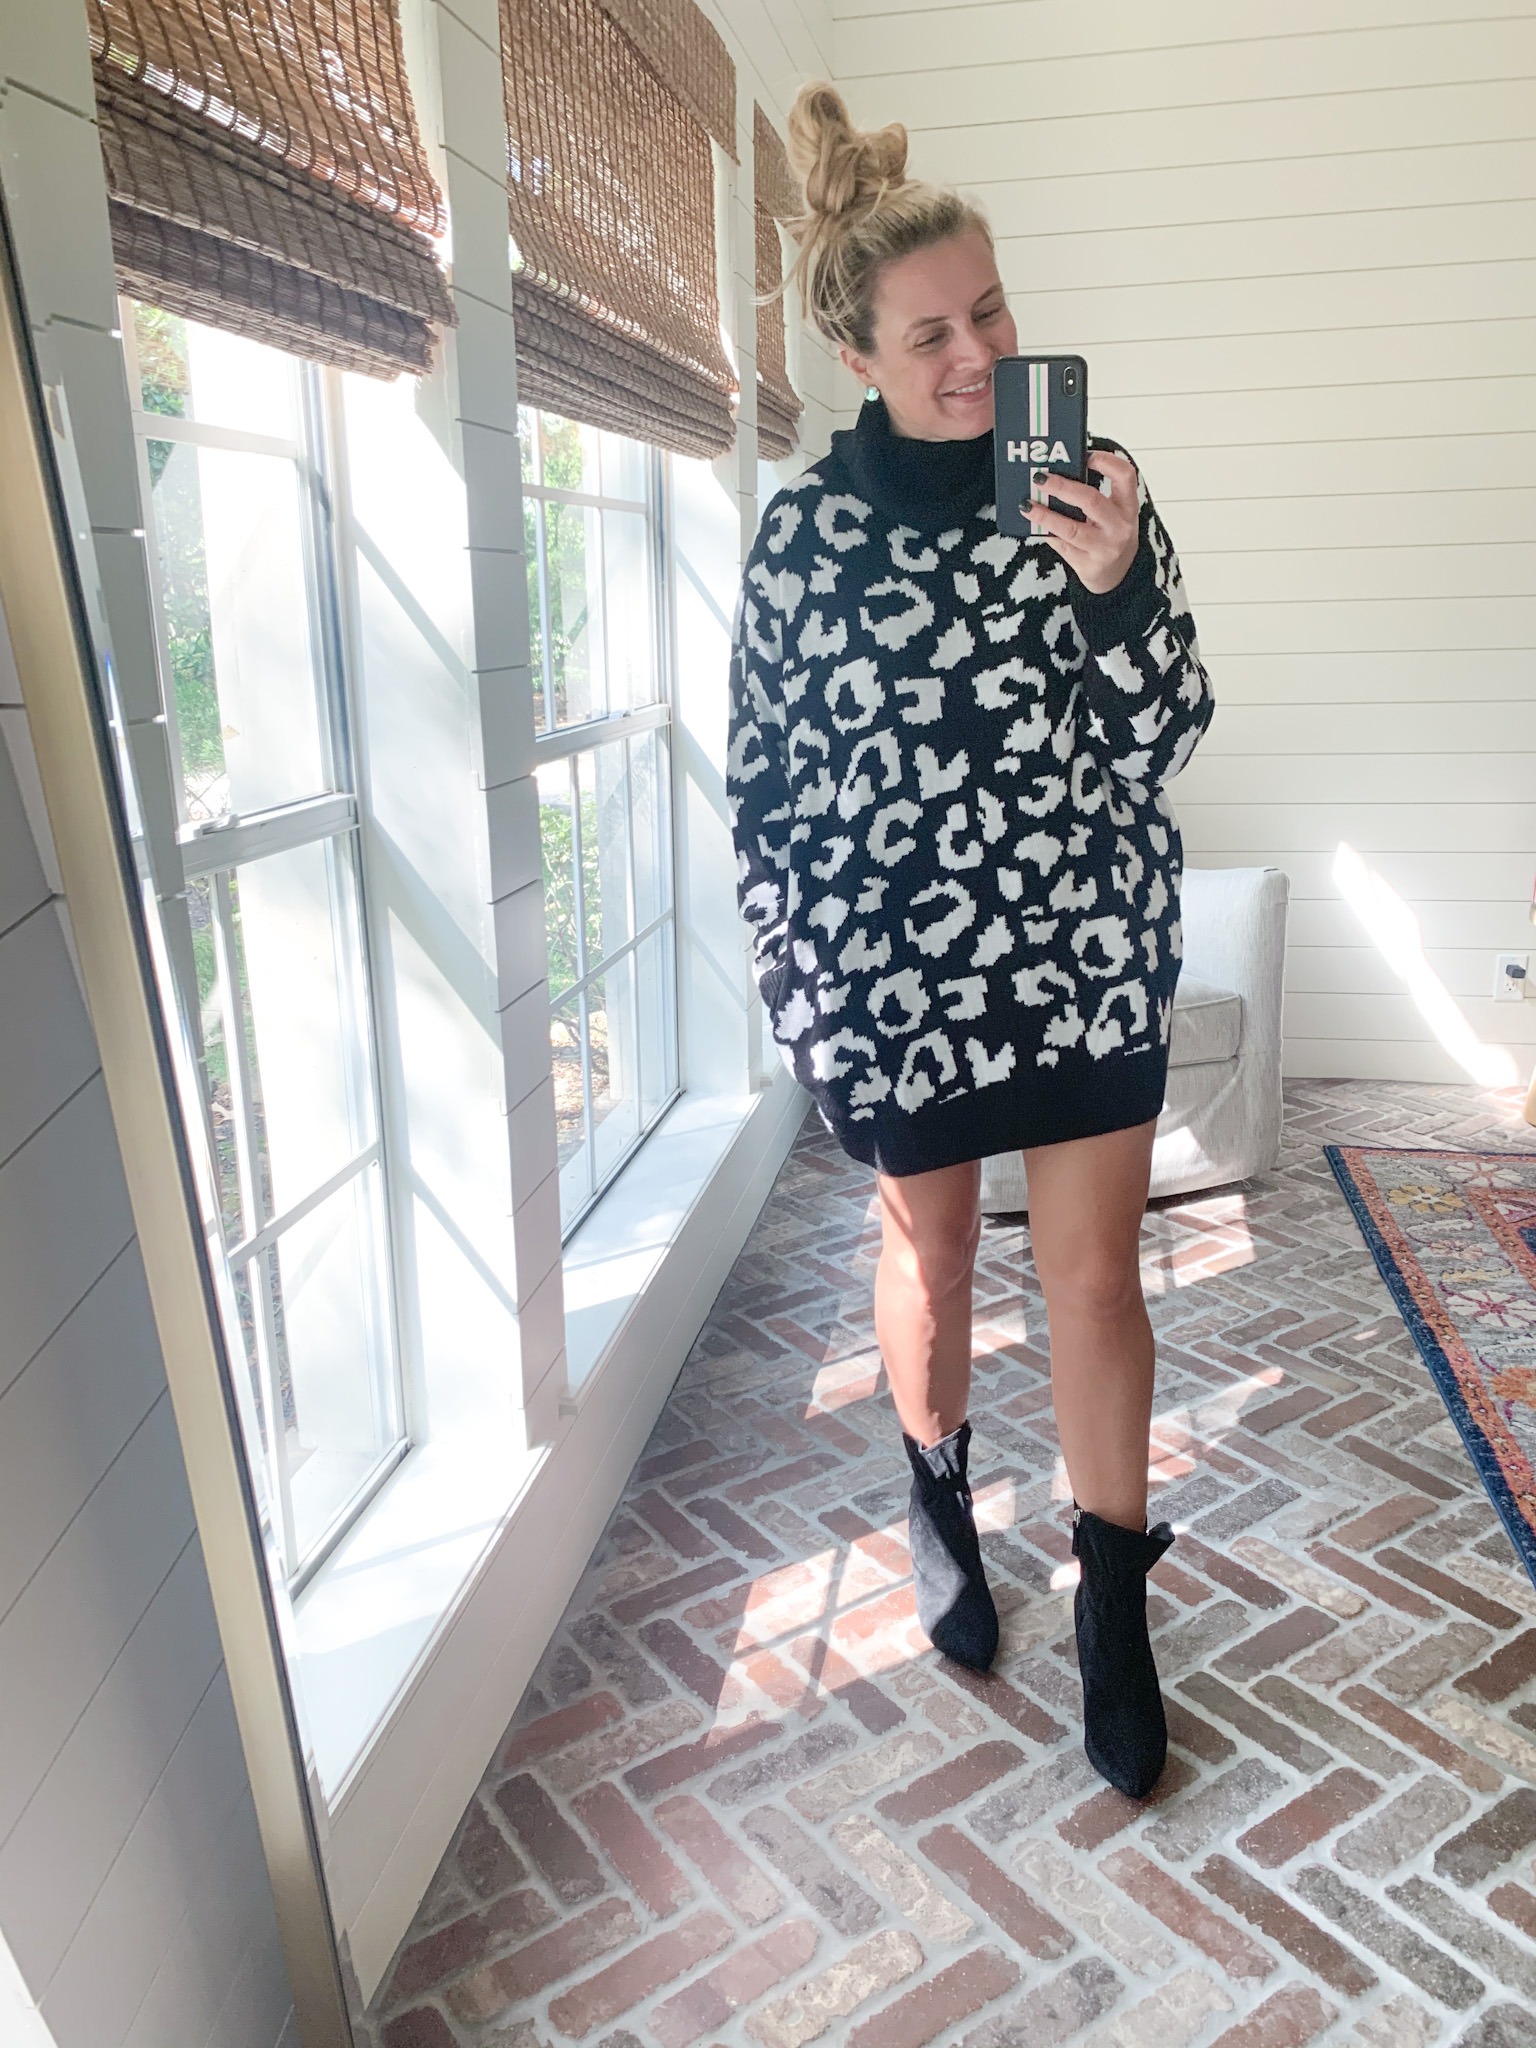 Amazon Haul by popular Houston fashion blog, Fancy Ashley: image of a woman wearing a Amazon Pink Queen Women's Loose Oversize Turtleneck Wool Long Pullover Sweater Dress and Walmart Scoop Women's Blair Scrunch Stiletto Heeled Booties